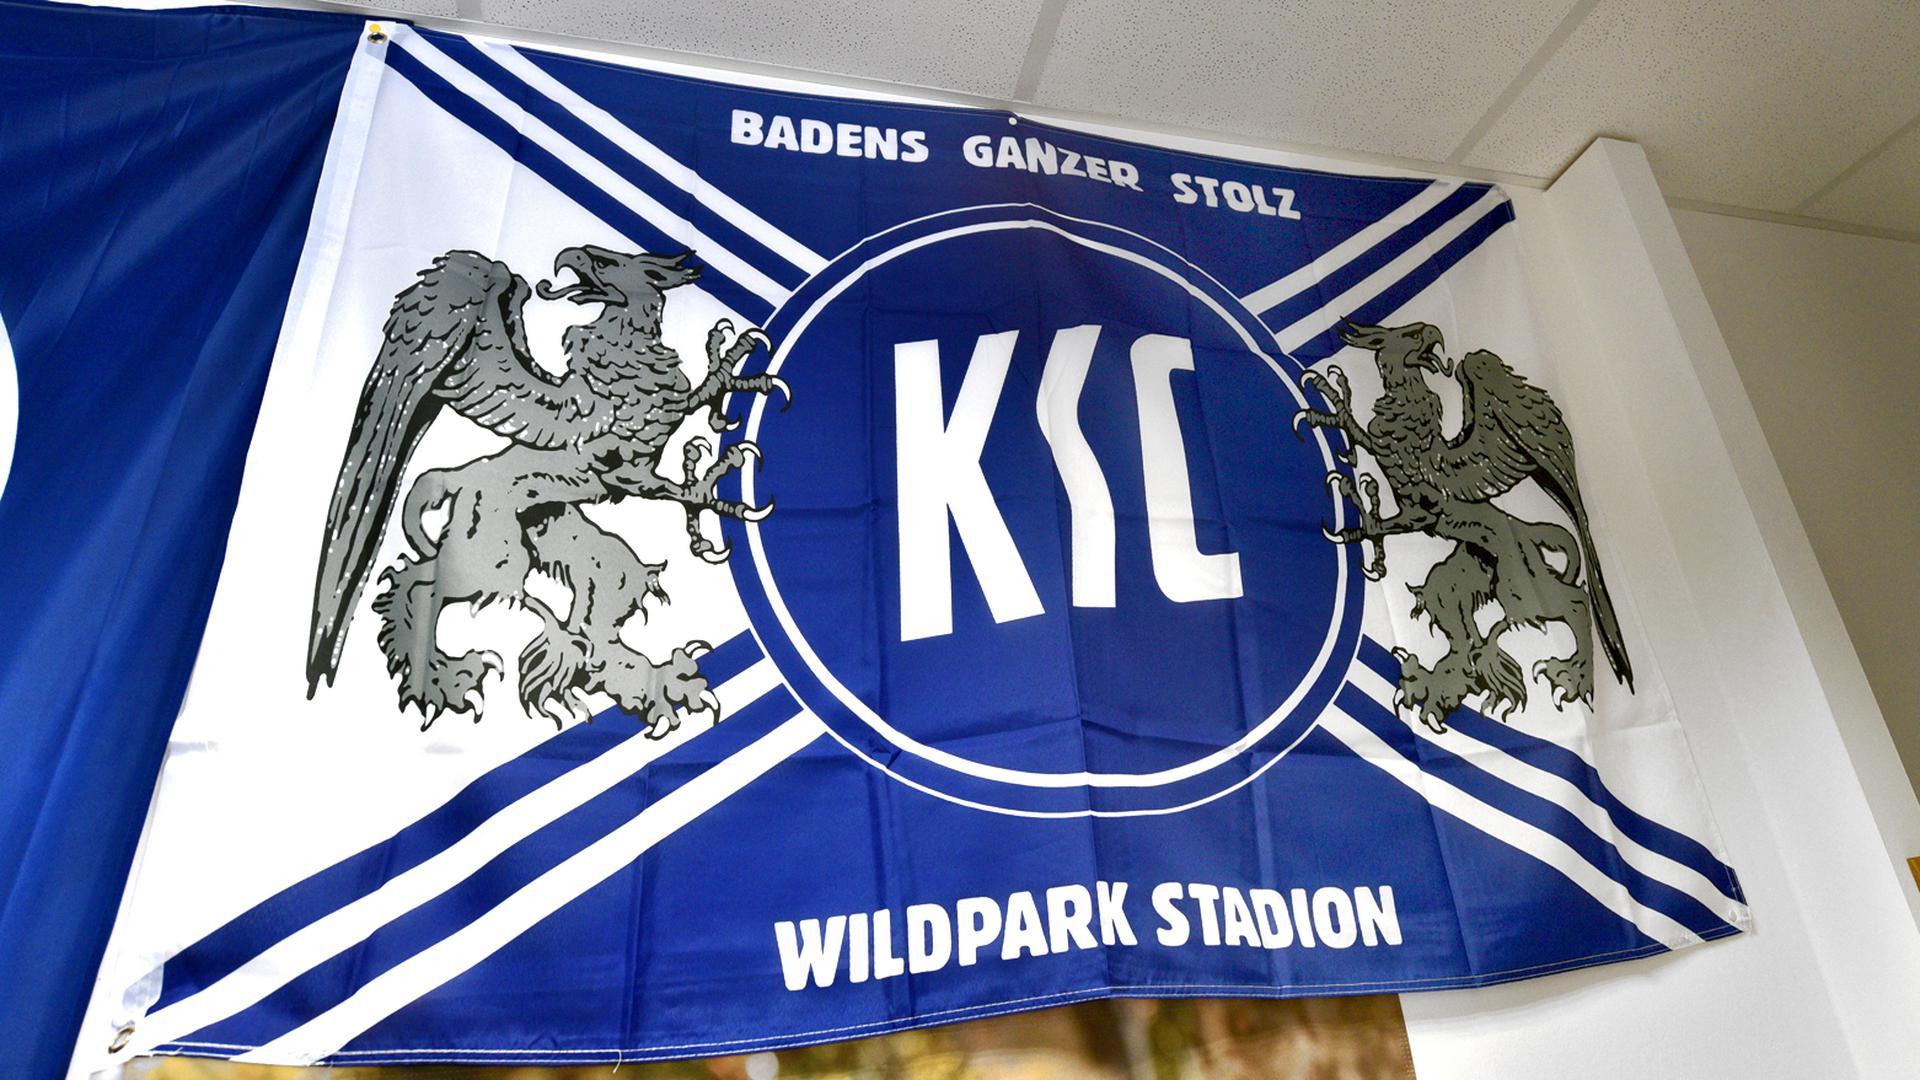 Die KSC-Flagge in Karlsruhe (Symbolbild)